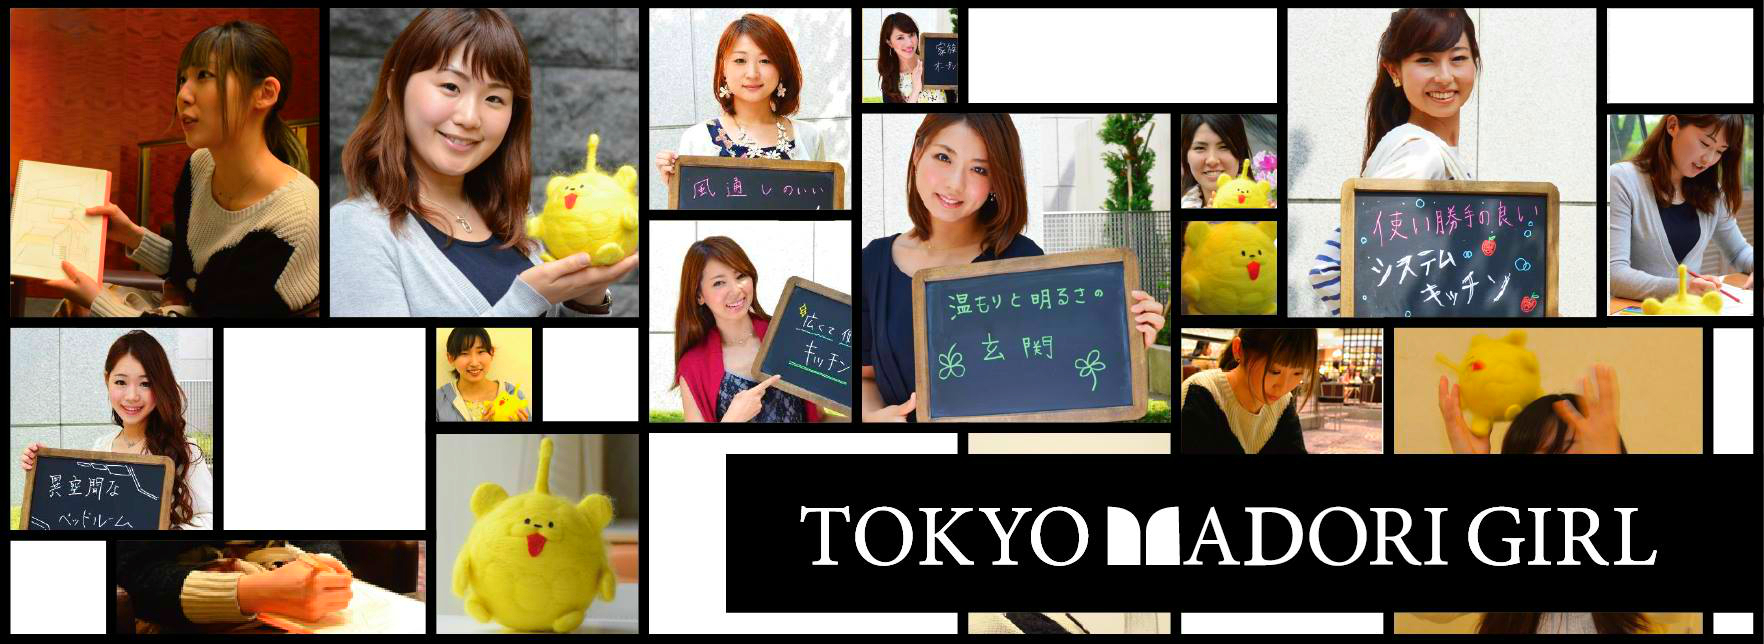 TMG イメージ画像